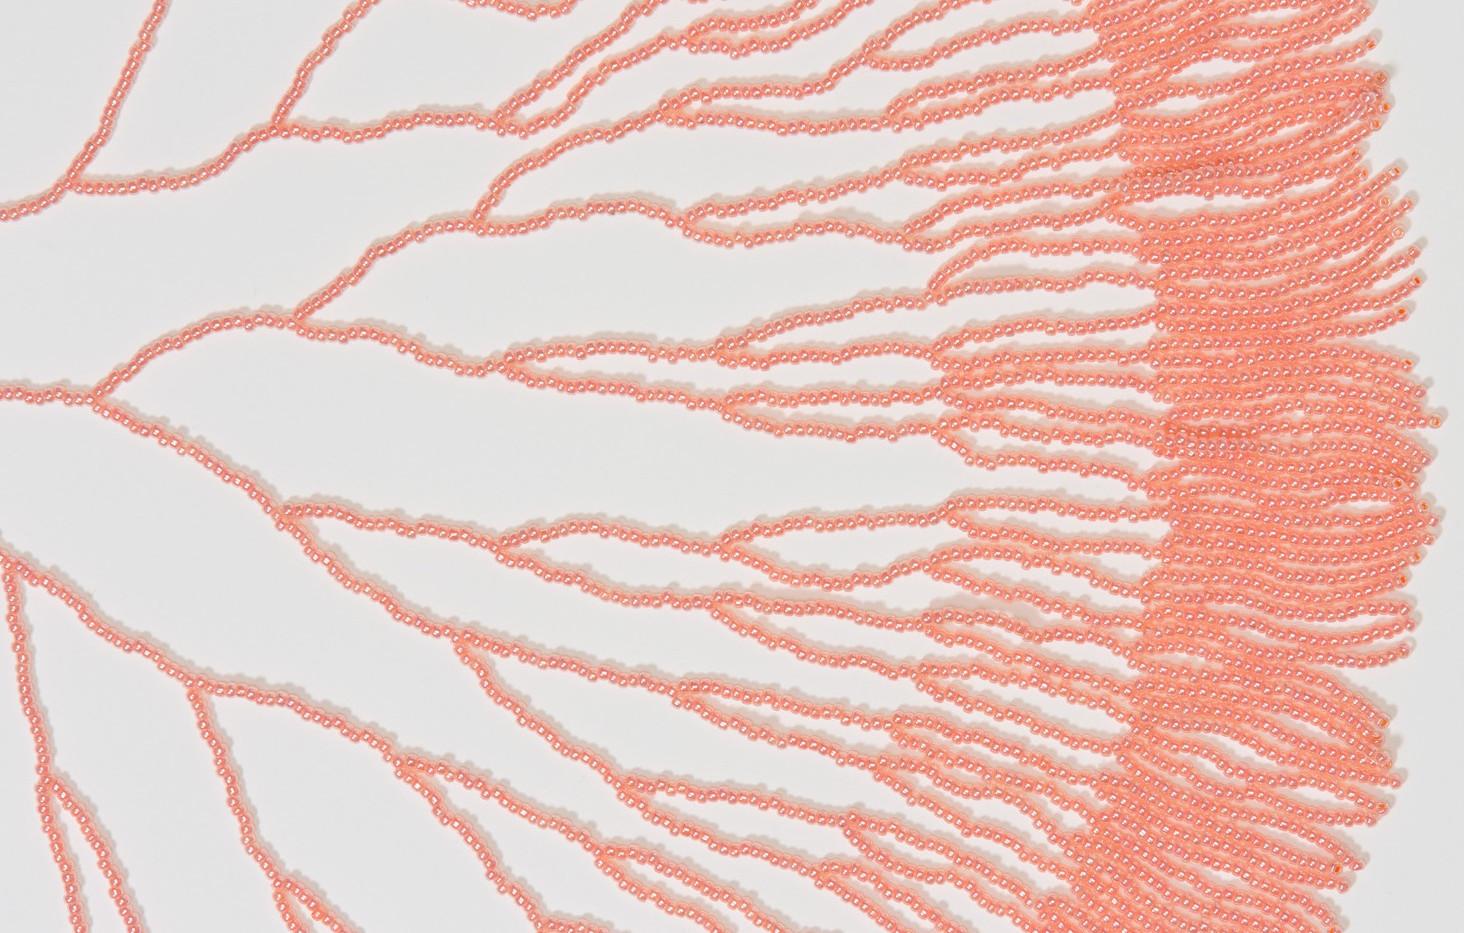 Bifurcate - detail